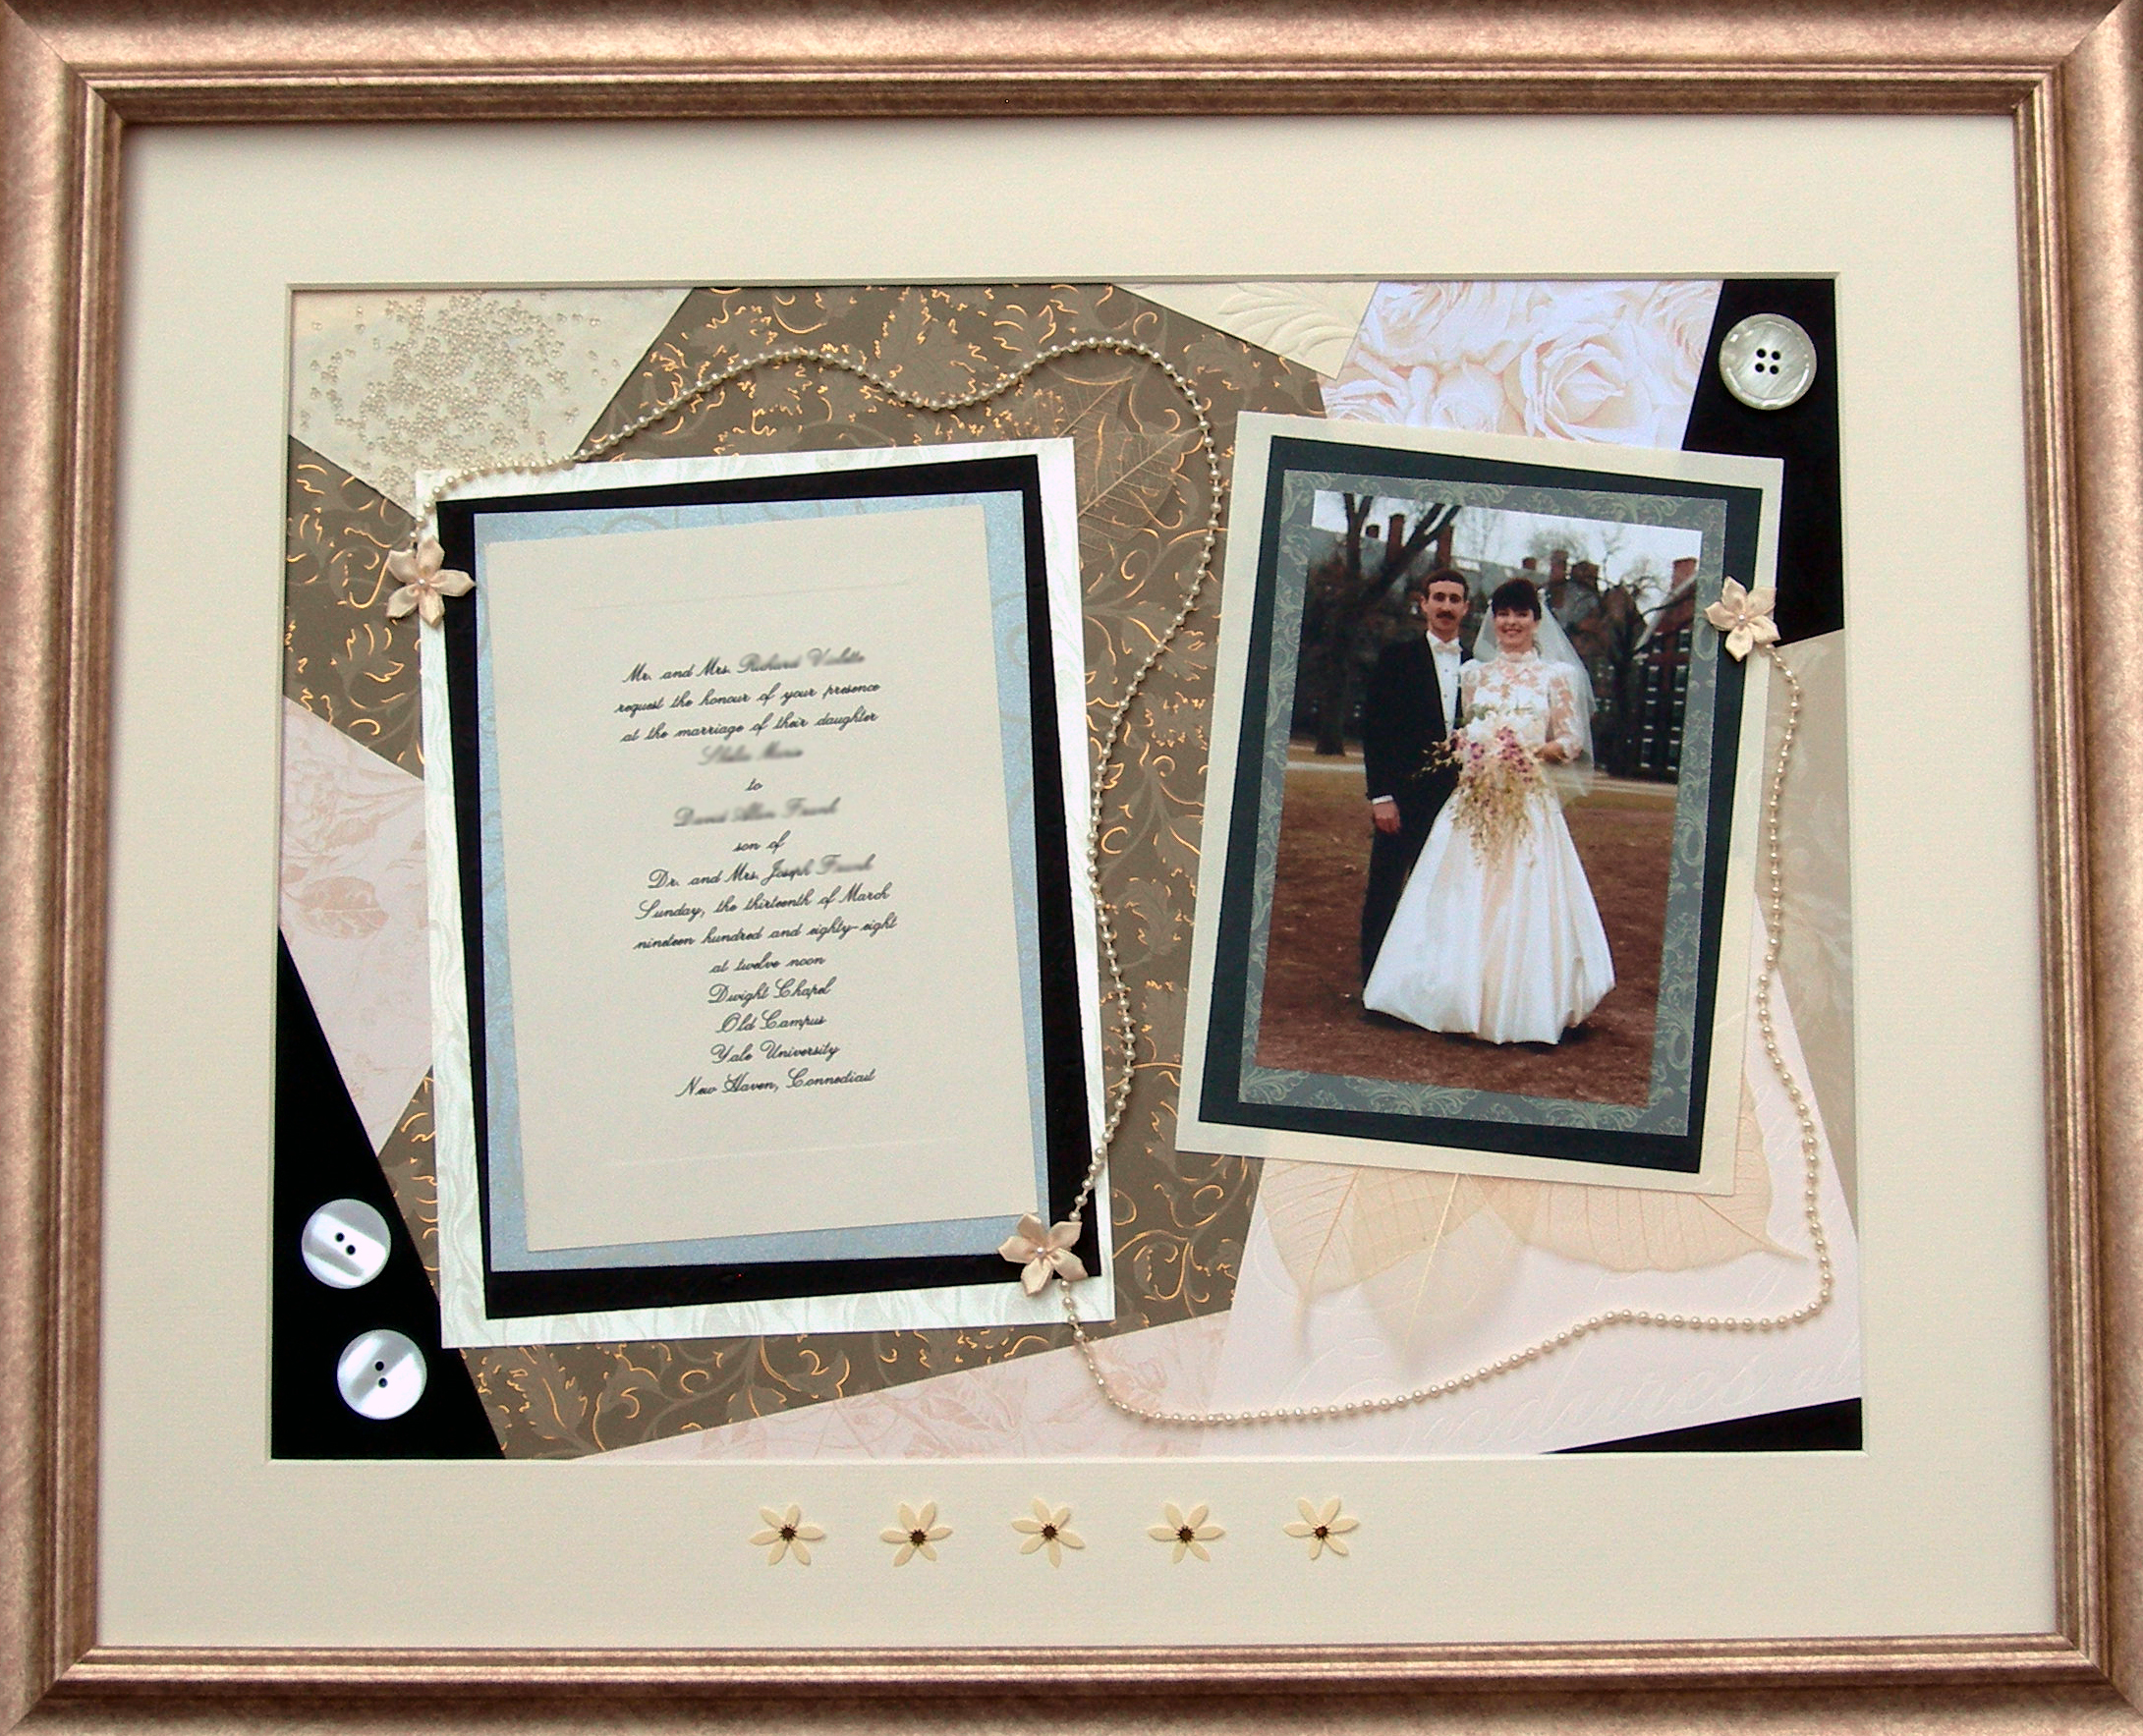 Stationery, invitation, Invitations, Gift, Anniversary, Personalized, Keepsake, Framed, Purple raincoat, Milestone, 20th